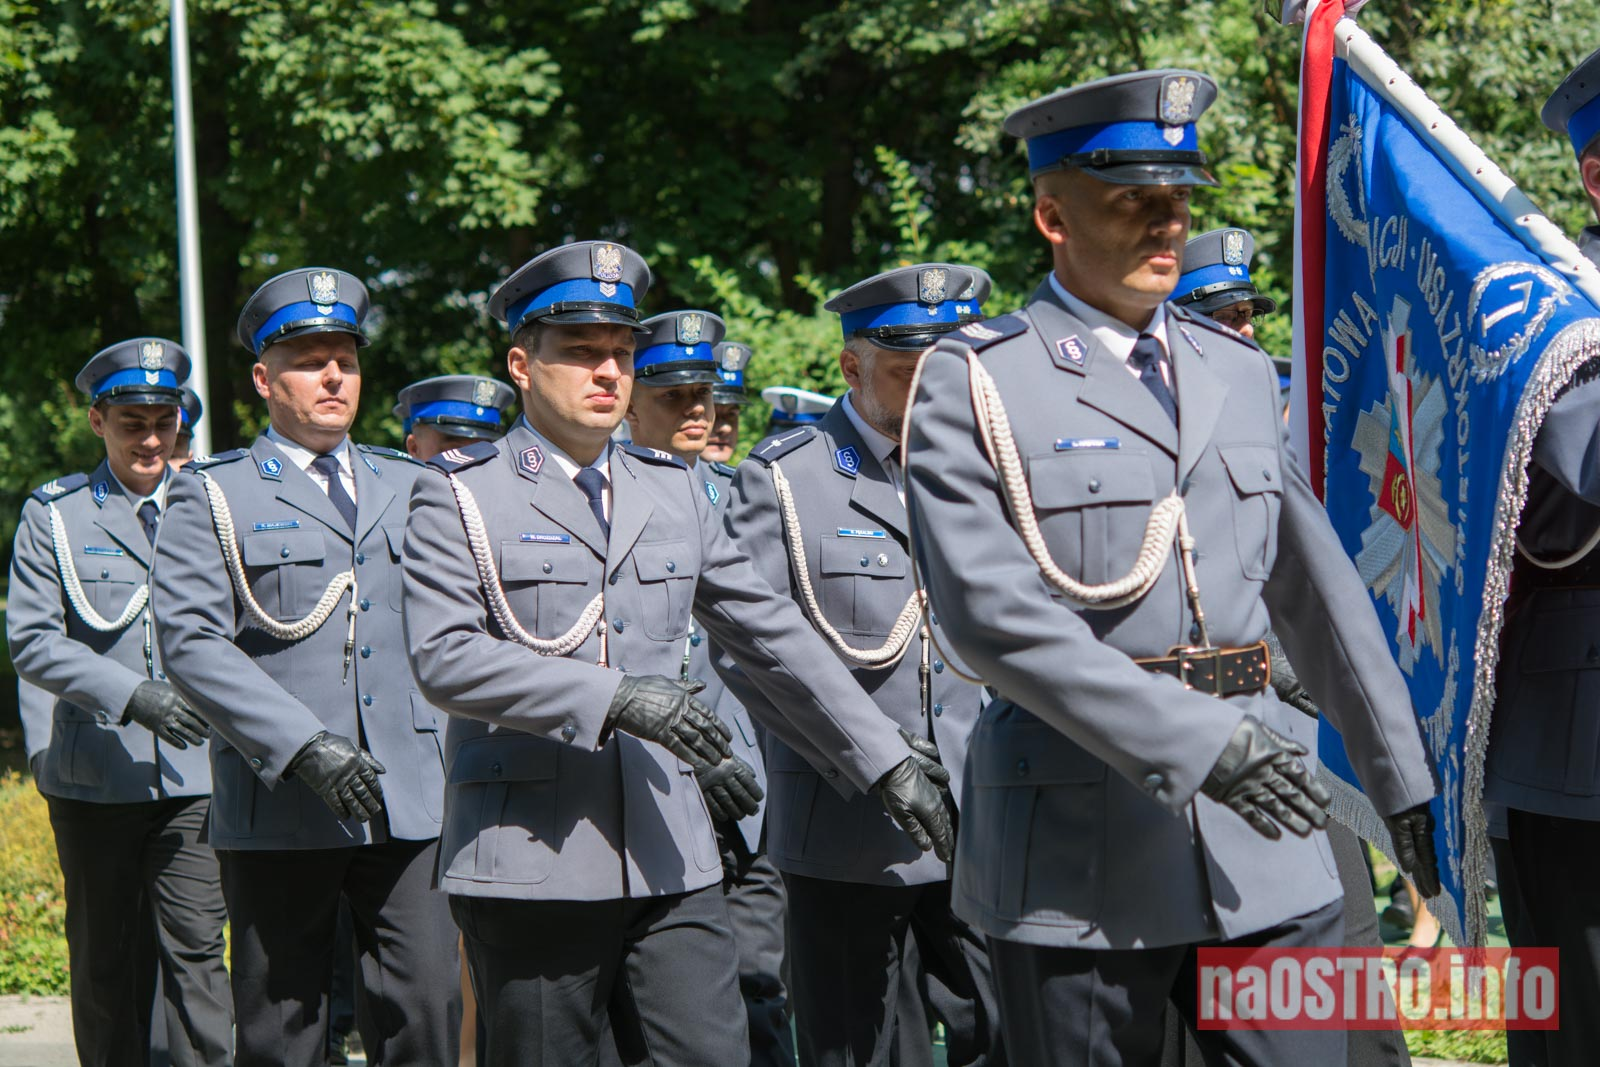 NaOSTRO swieto policji-8